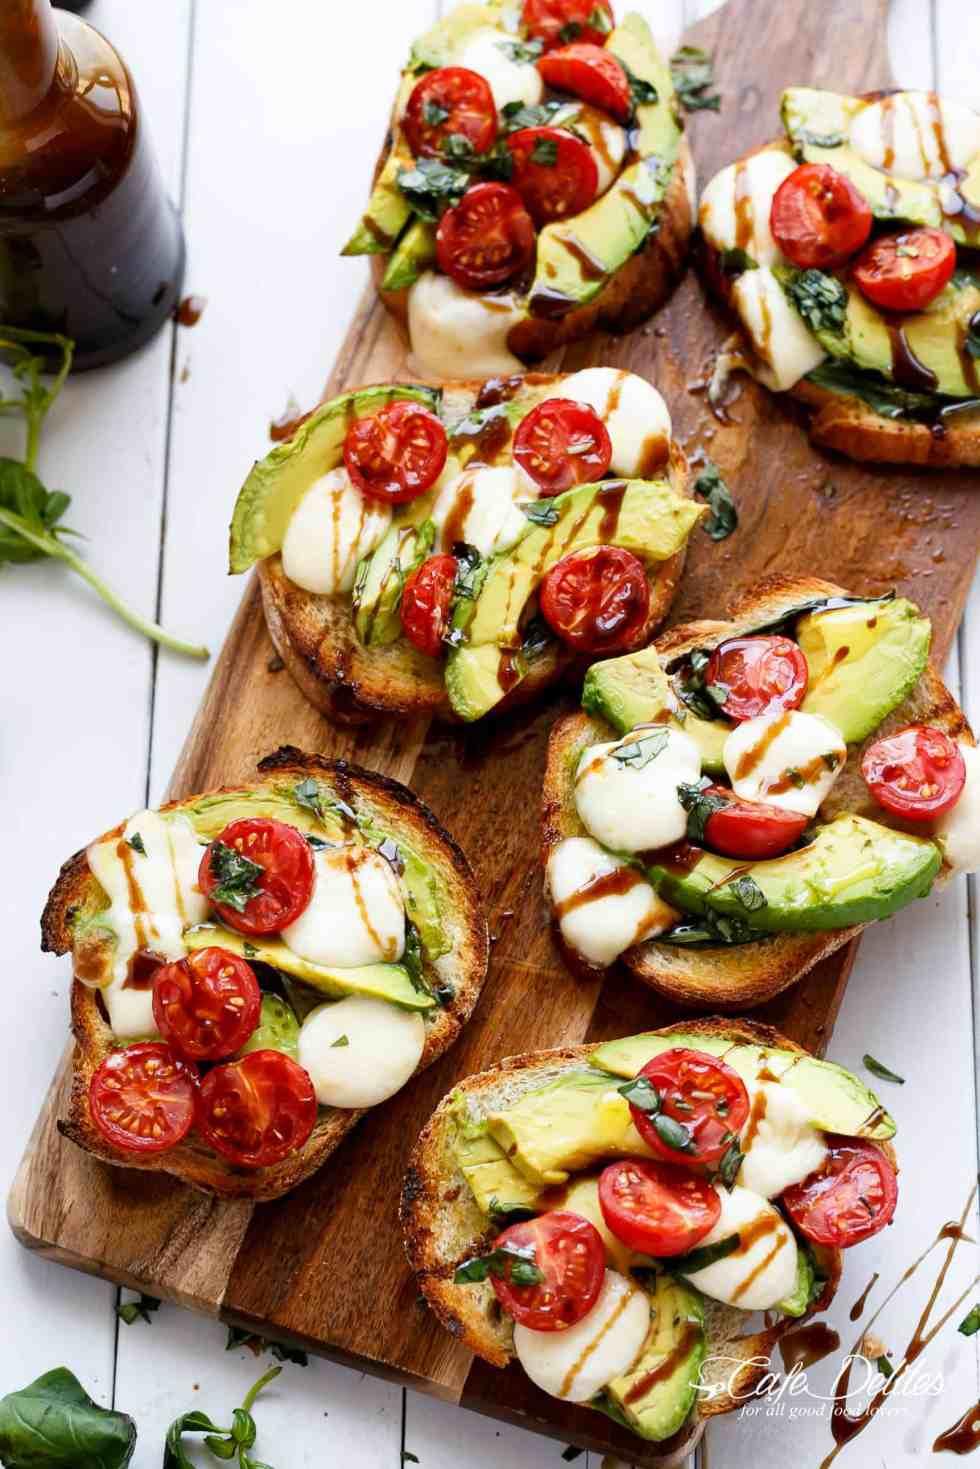 Avocado Caprese Garlic Breads are so easy to make and delicious!